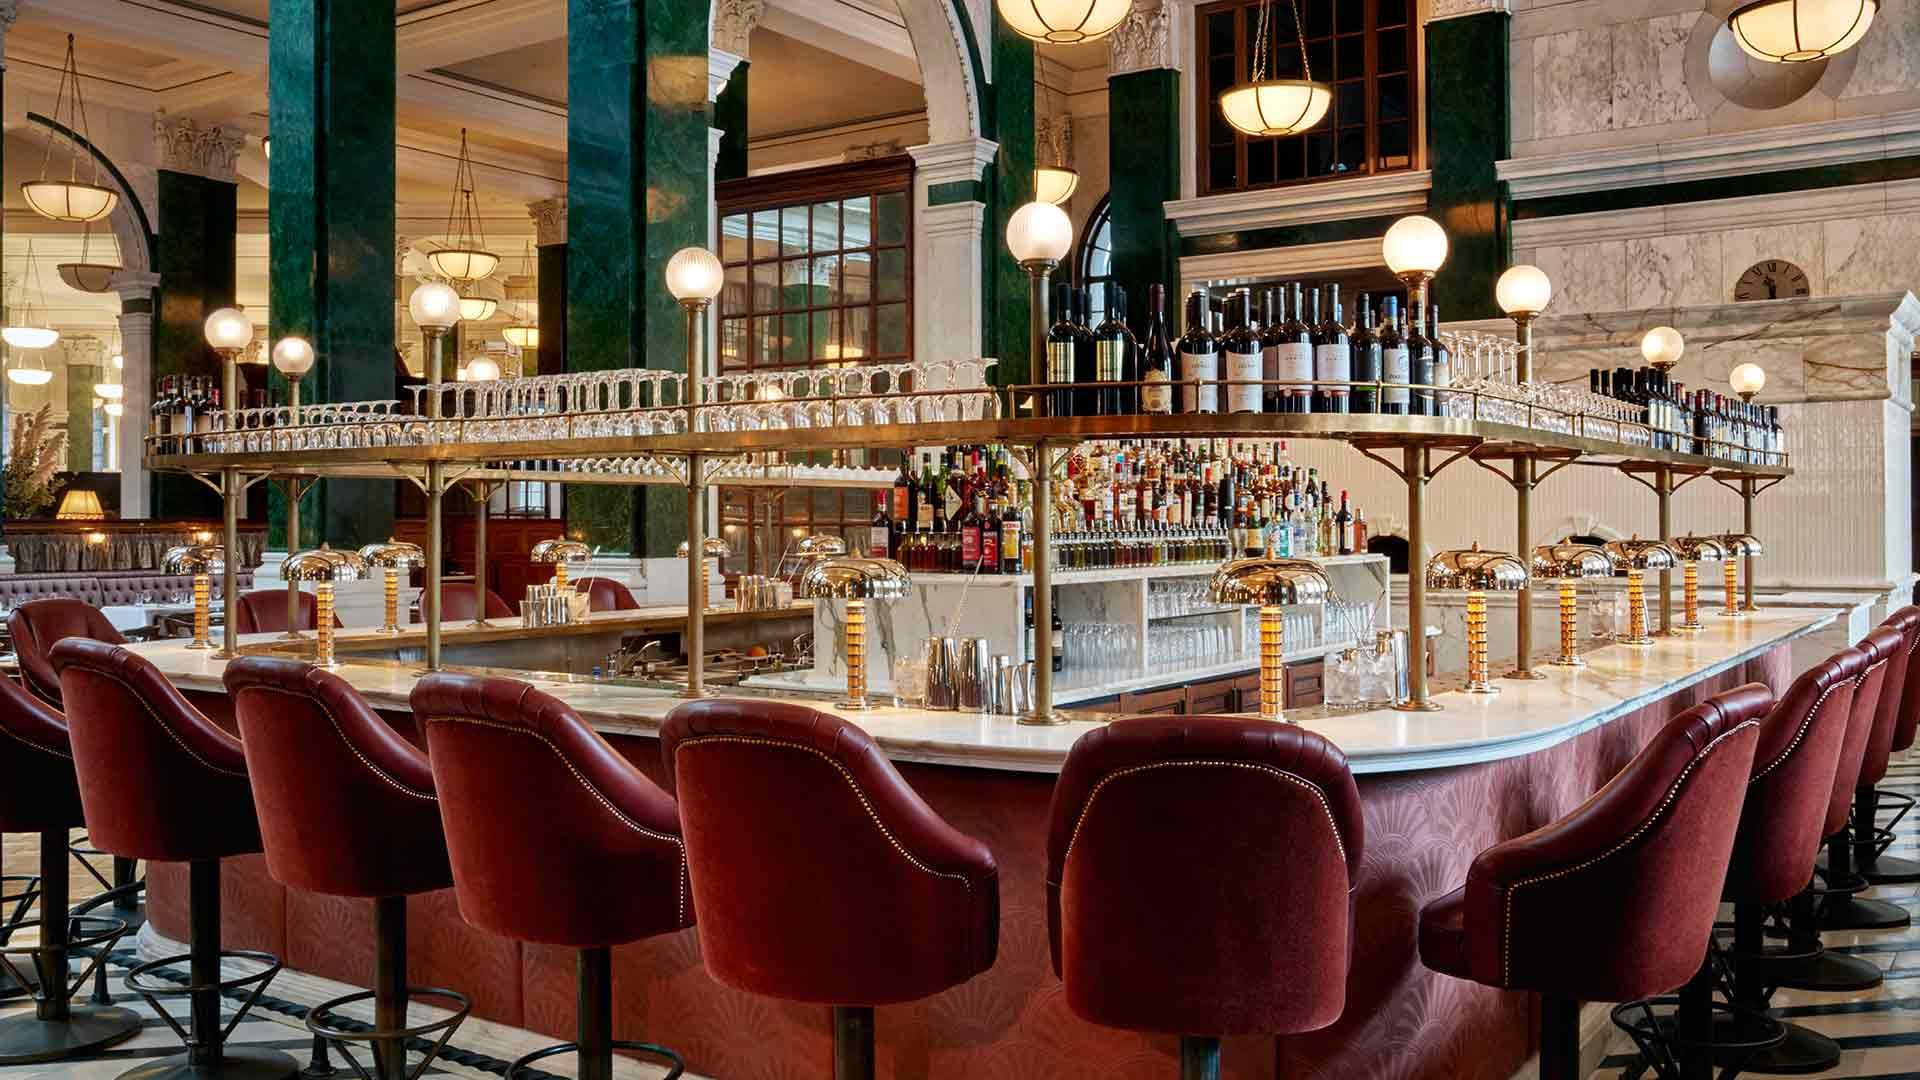 Art Deco Luxury Bar Interior Lighting Scheme Pendants Historic Location Consultants Nulty